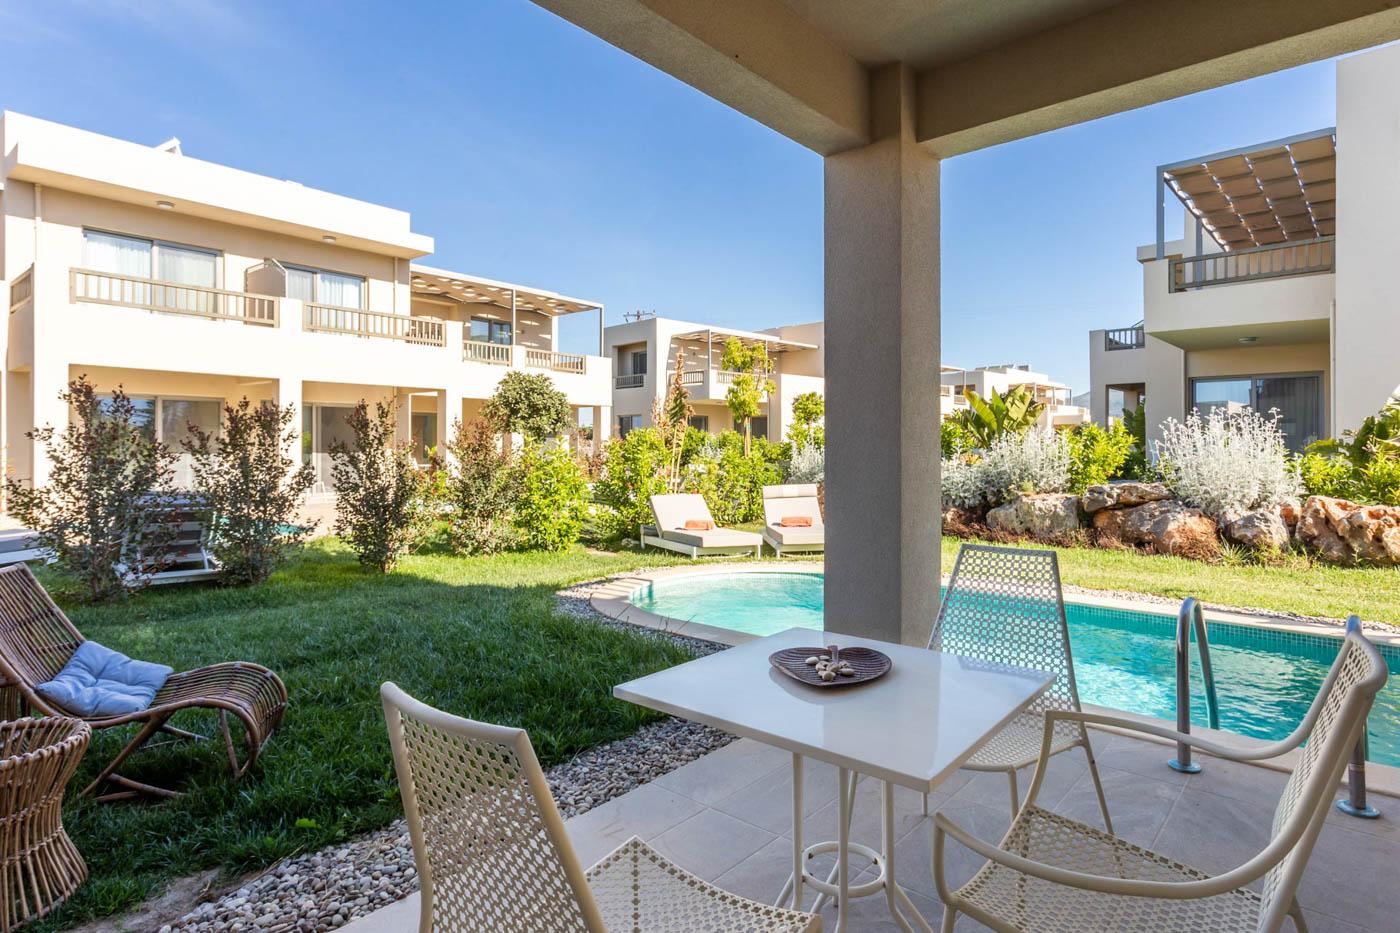 Elysian luxury hotel and spa Kalamata outside personal pool